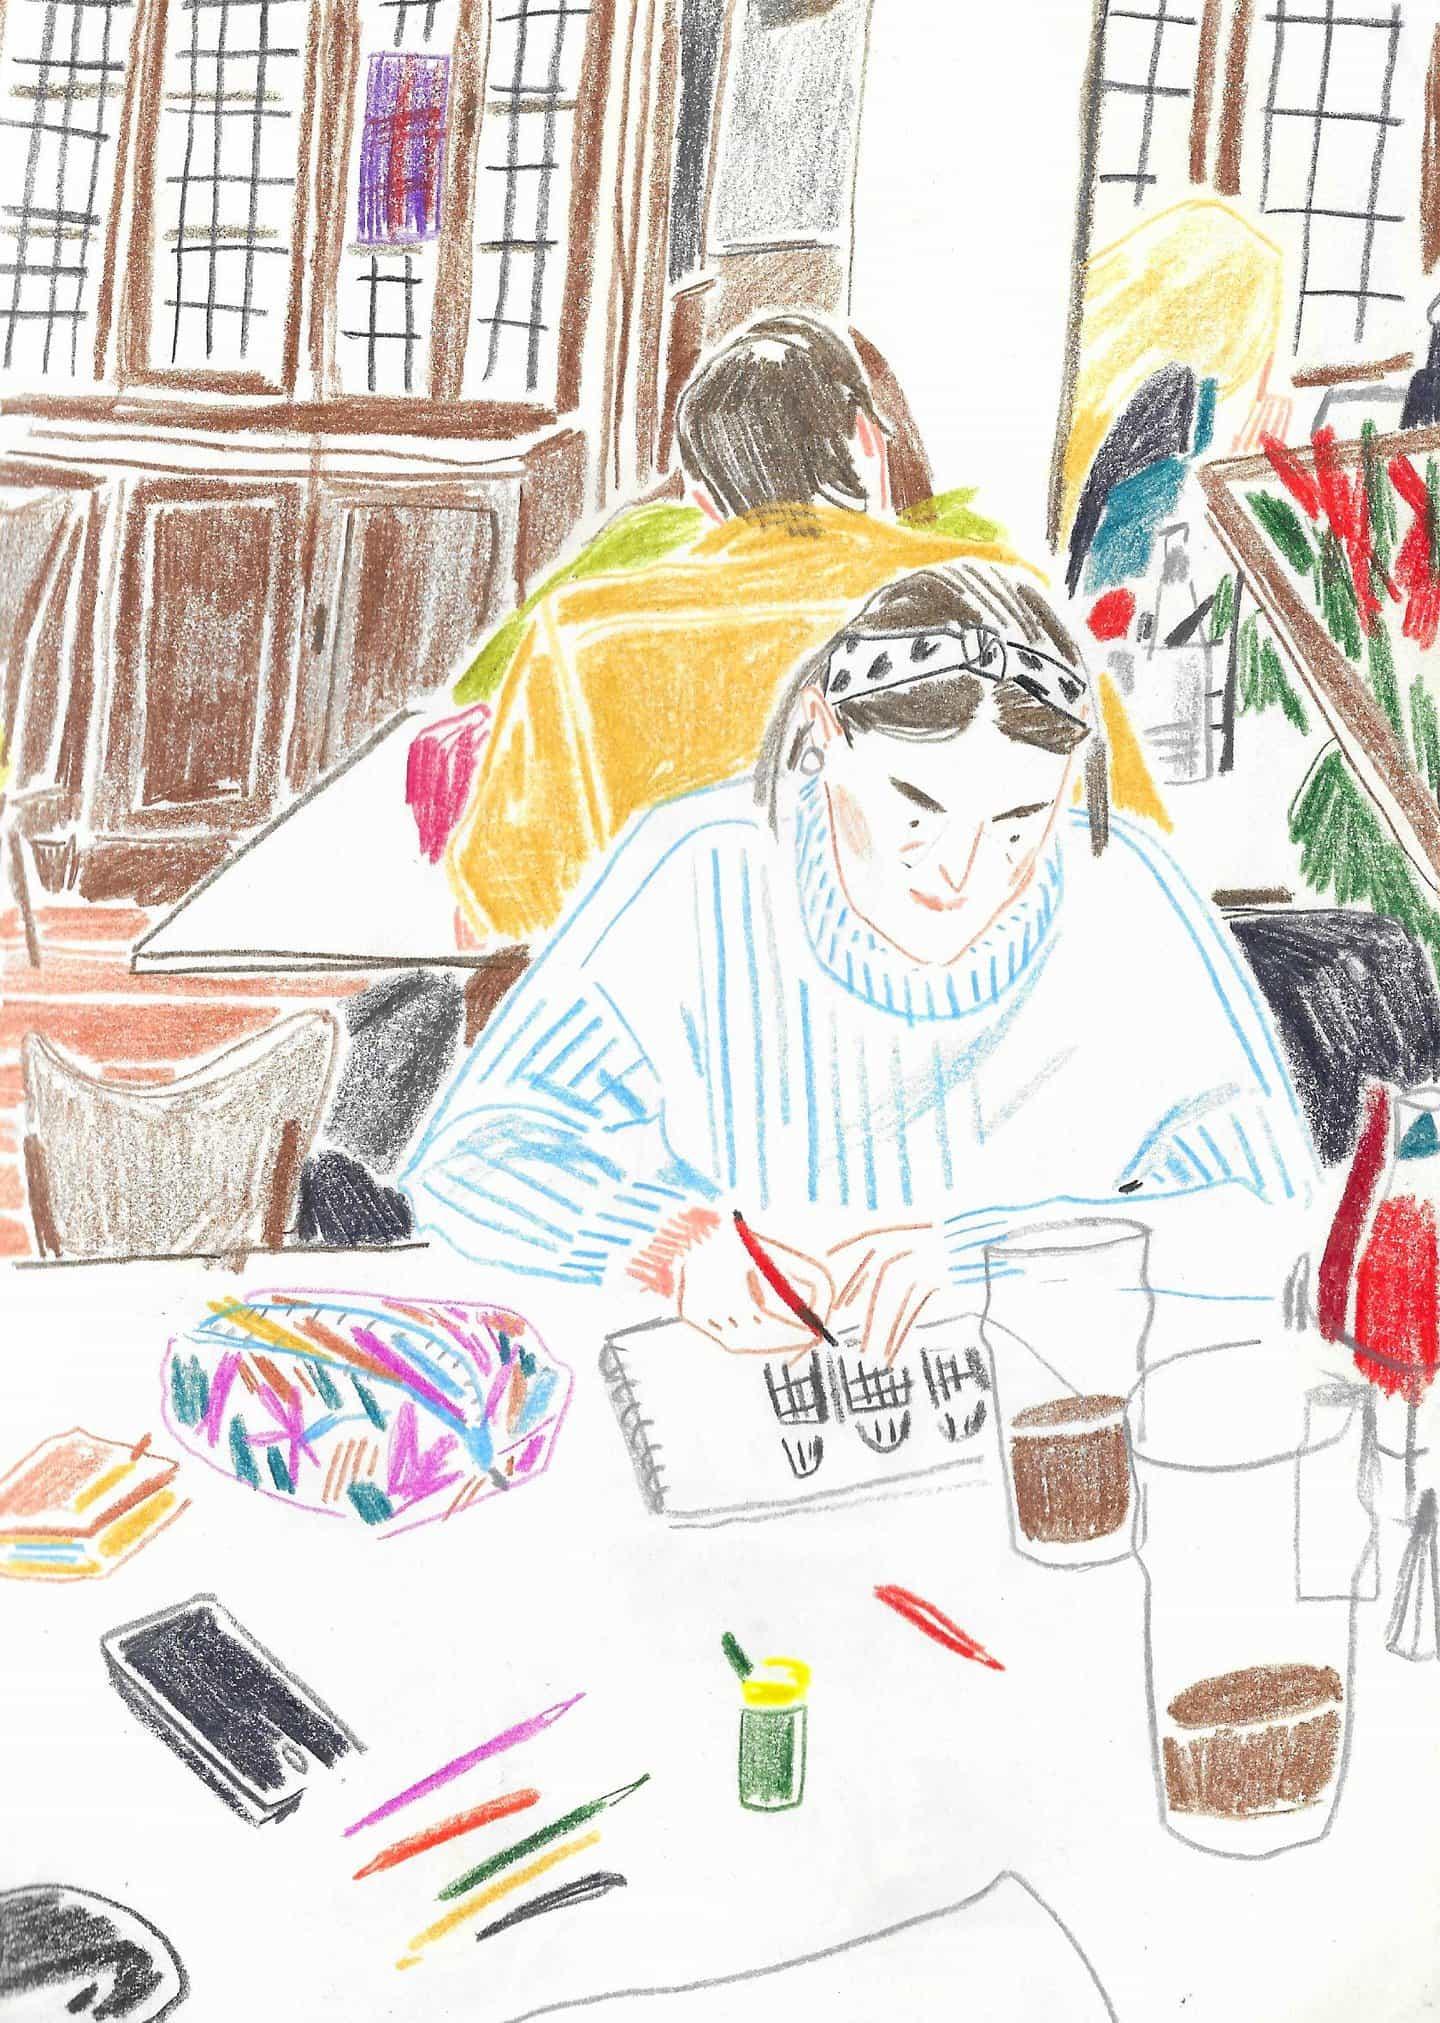 La ilustradora Amy Moss sobre evocar un sentimiento sobre la técnica formal